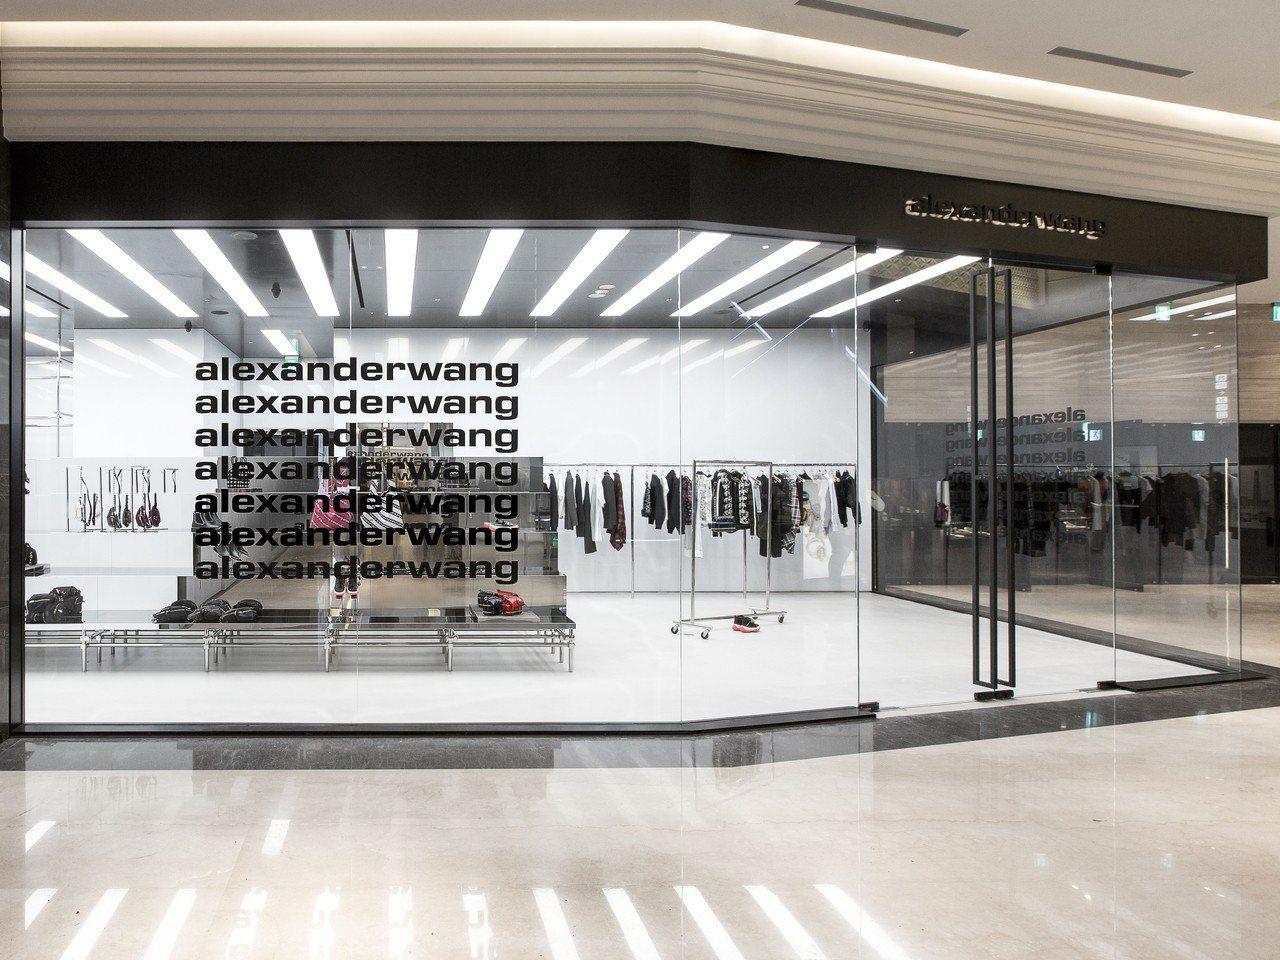 alexanderwang於台北微風南山開設台灣首家專門店。圖/alexande...